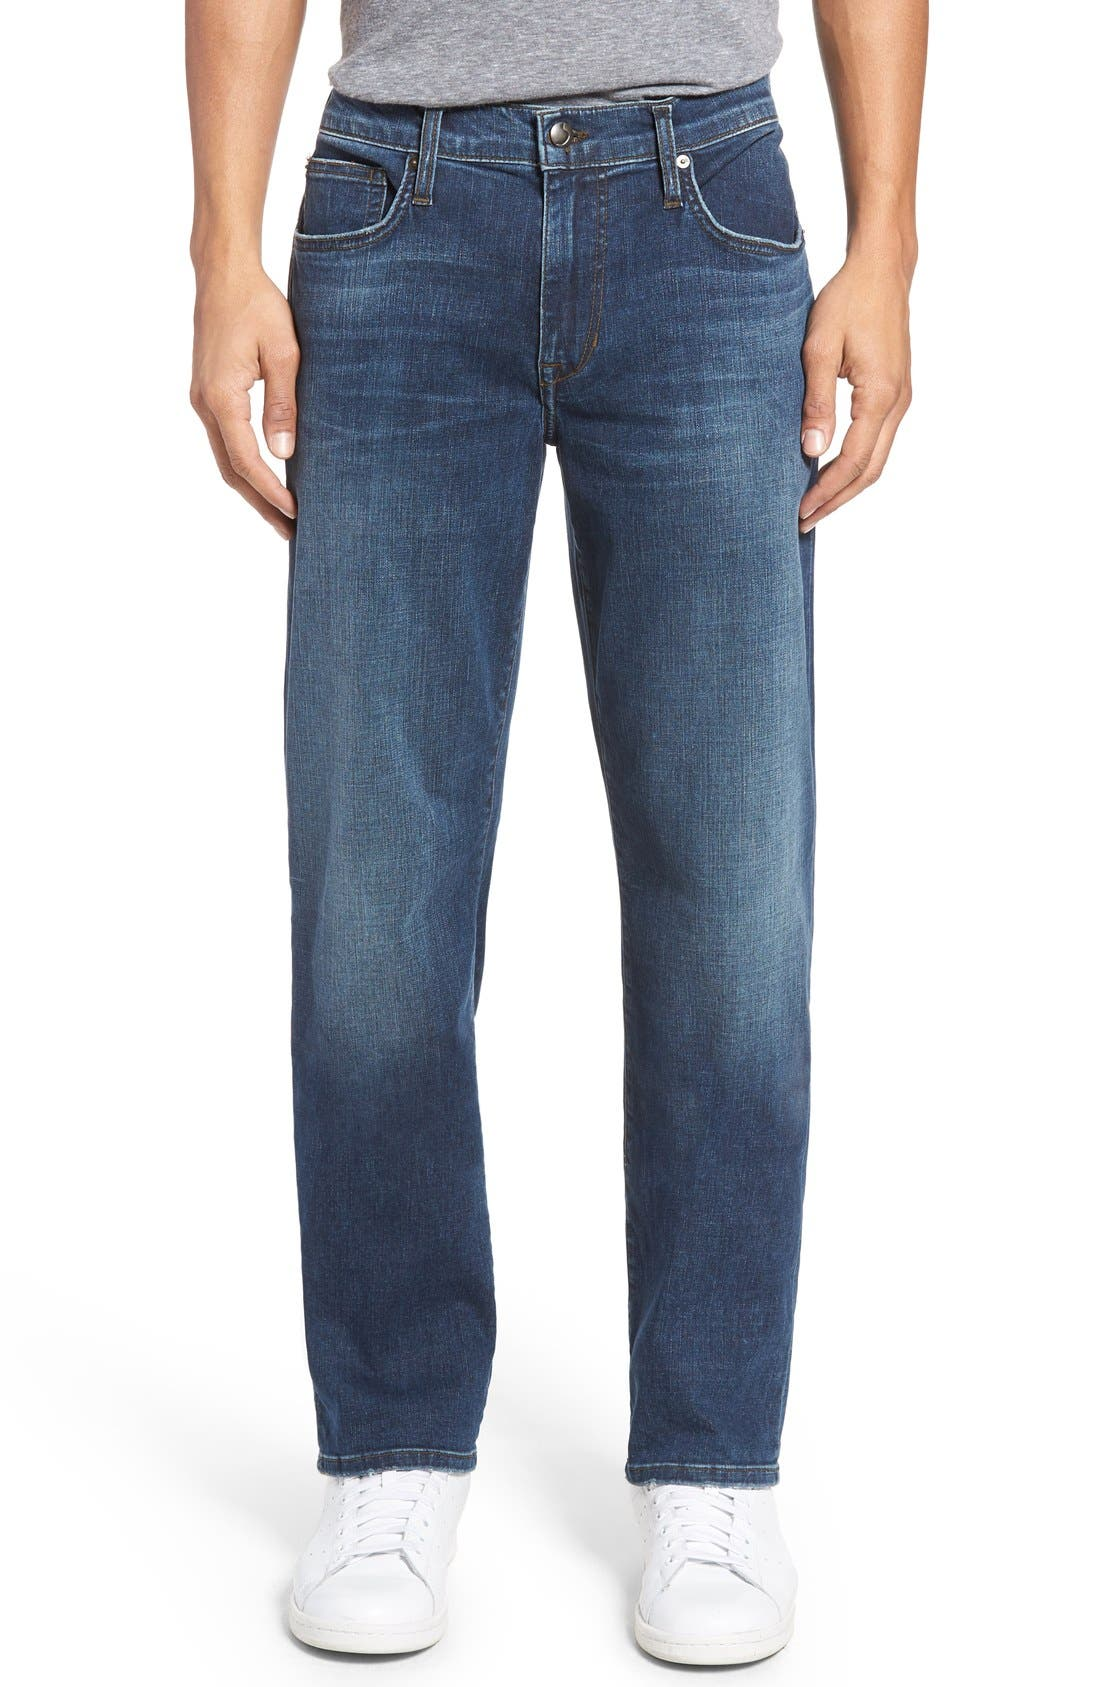 Brixton Slim Fit Jeans,                         Main,                         color, Gladwin